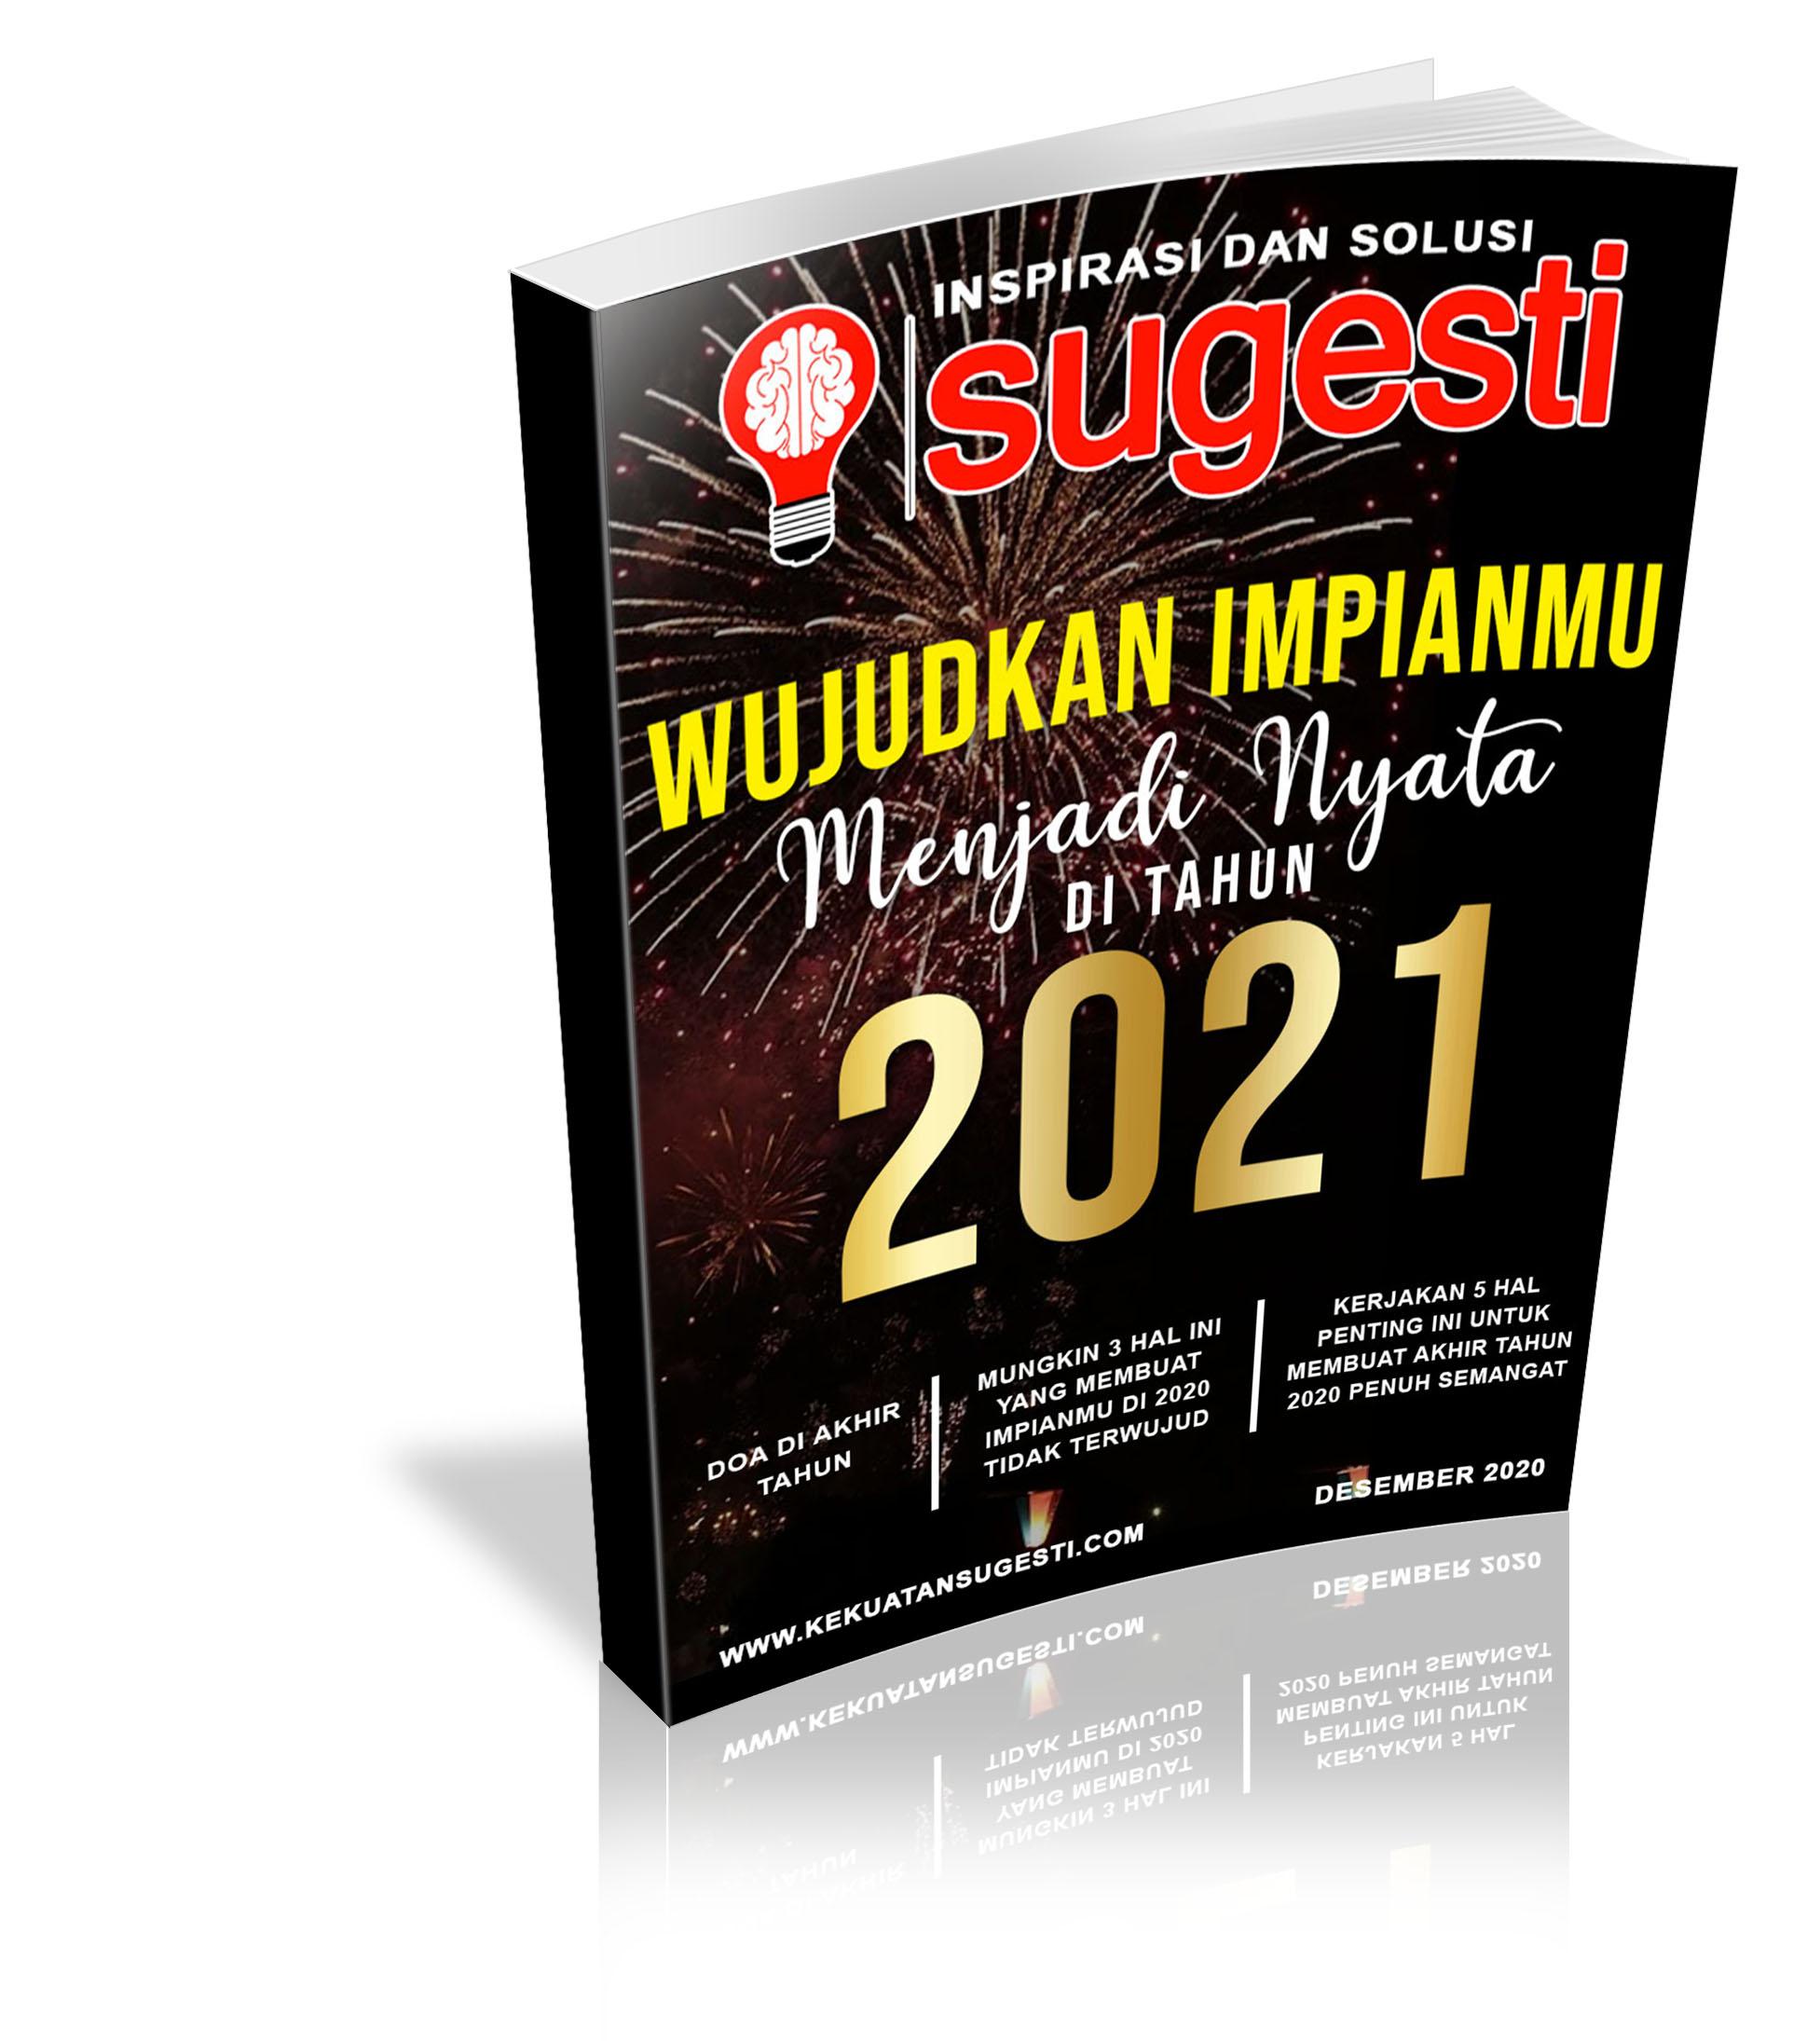 Majalah Sugesti Edisi Ke TujuhPuluh Delapan Bulan Desember 2020